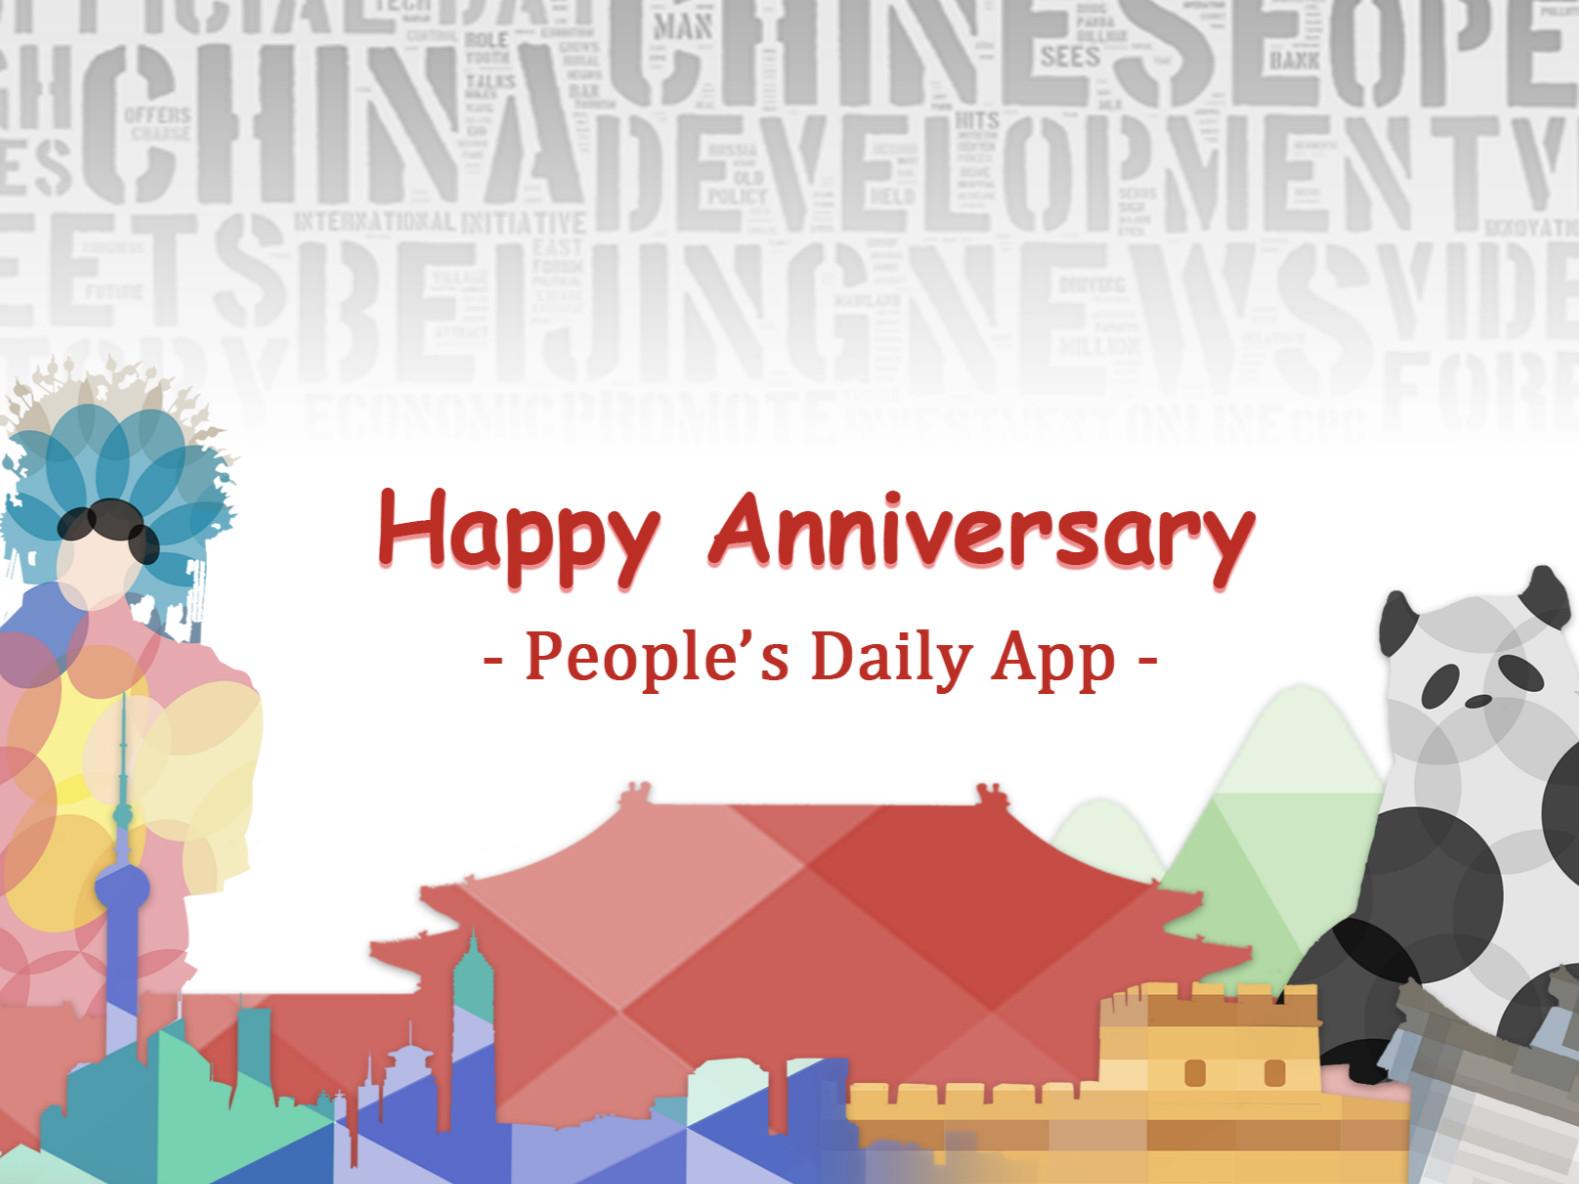 Happy Anniversary, People's Daily app!